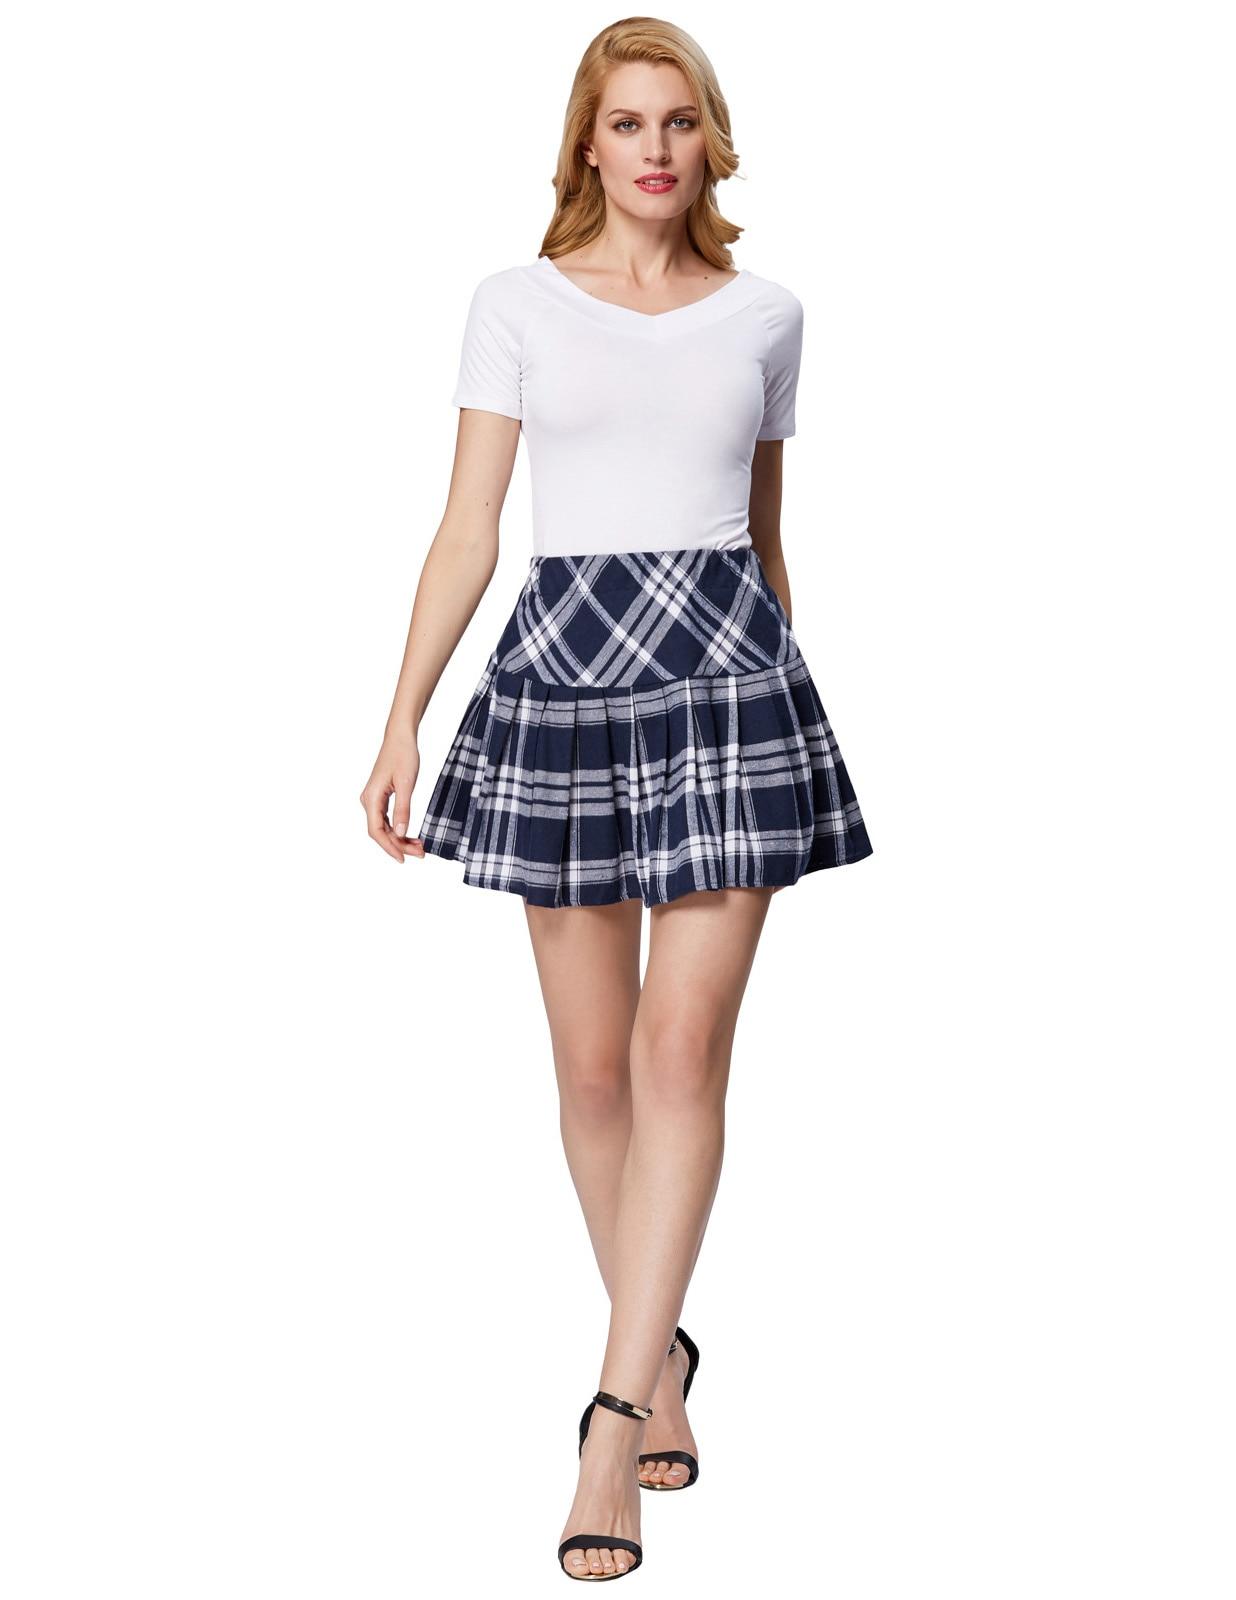 women skirt 2018 summer casual Retro Vintage Elastic Waist Pleated Flared Mini party Skirt